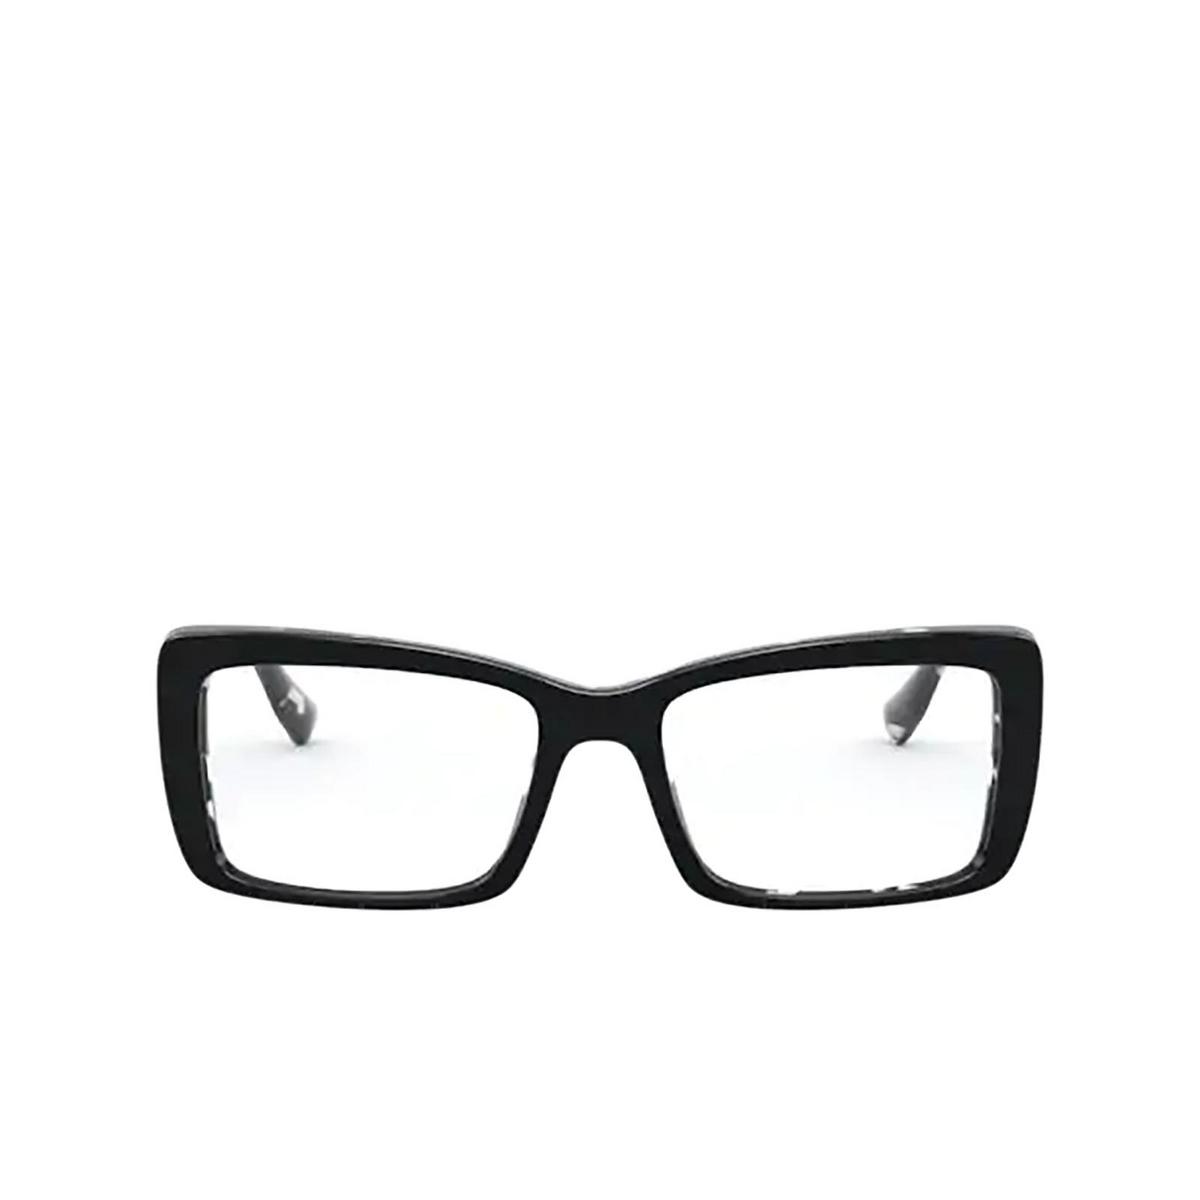 Miu Miu® Rectangle Eyeglasses: MU 03SV color Havana Black White Top Black 06E1O1 - front view.